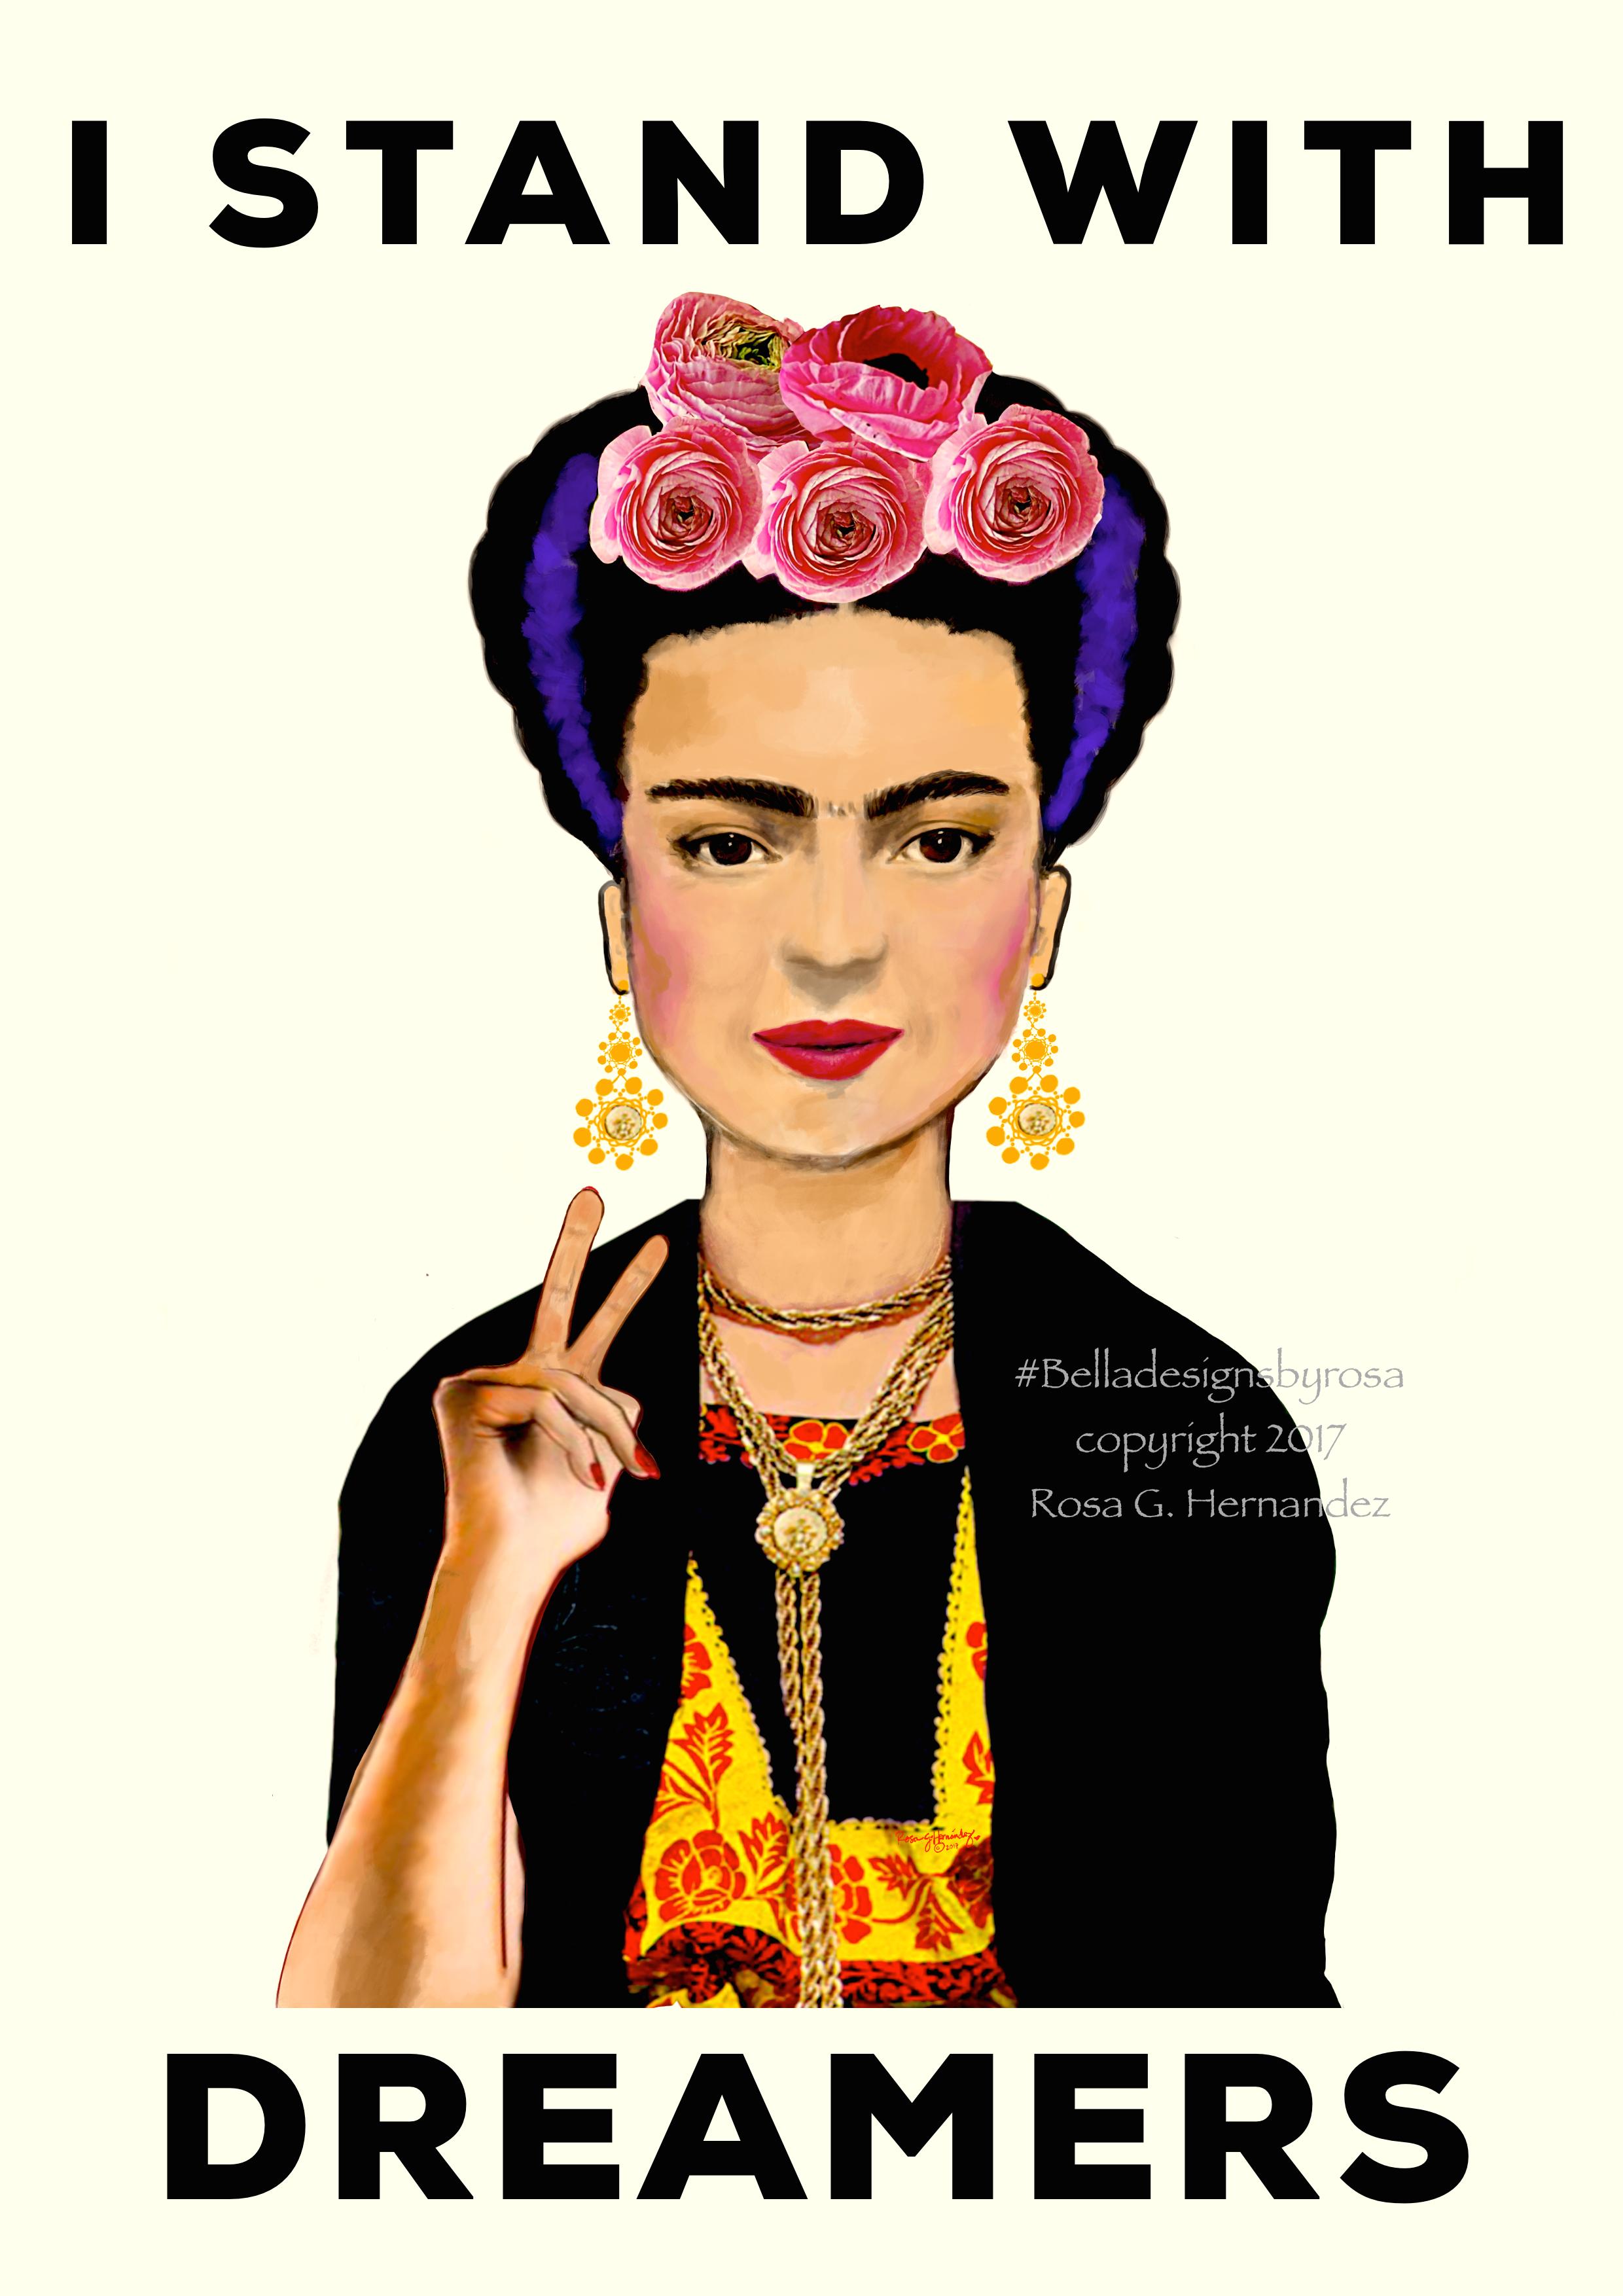 Frida Kahlo Dreamers Daca Santa Cruz Watsonville Sticker Etsy The Dreamers Frida Kahlo Female Artists